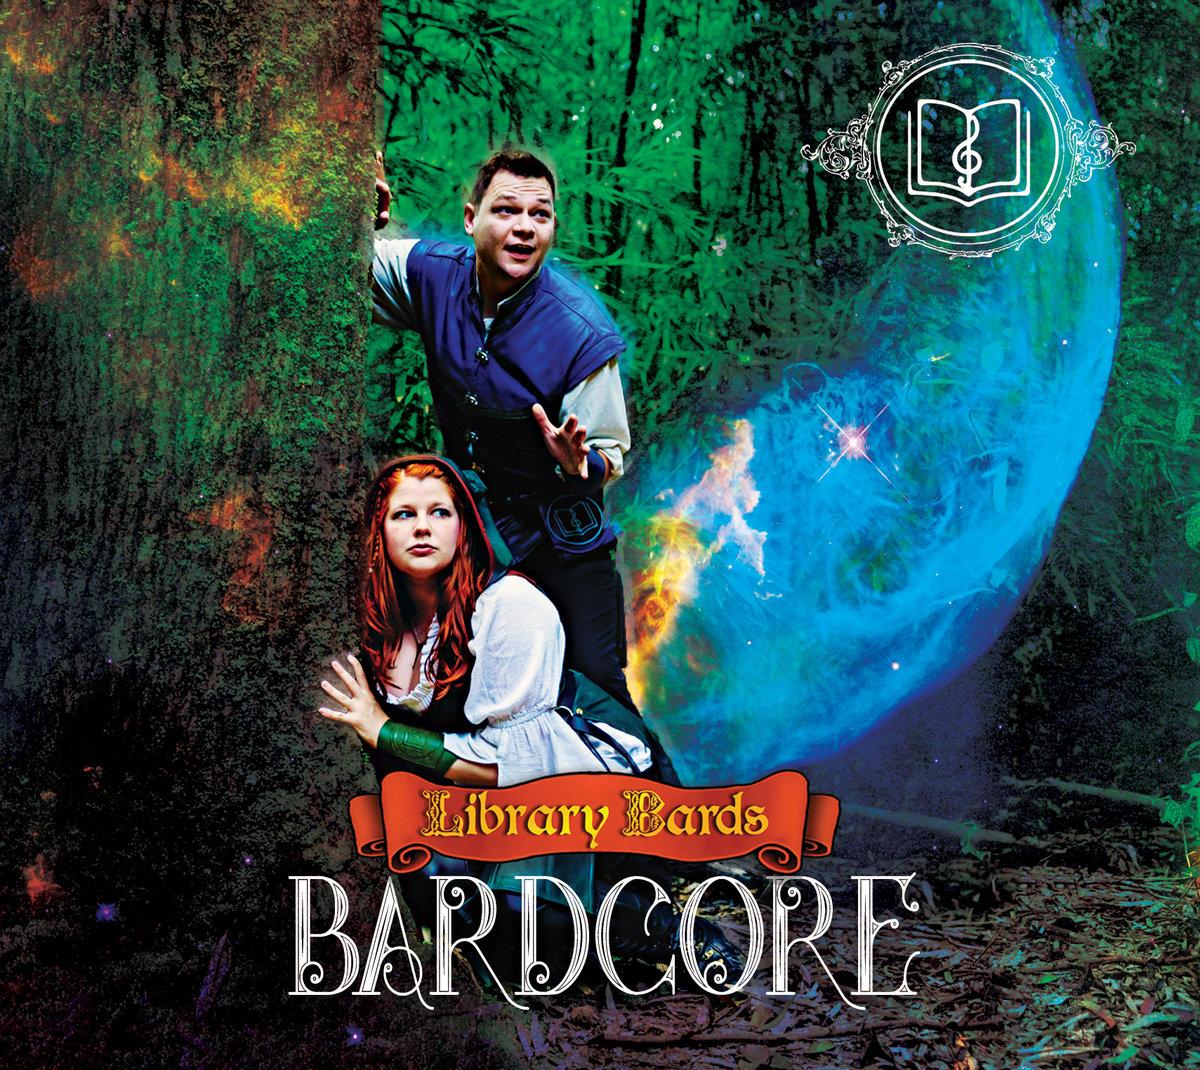 CLICK HERE FOR BARDCORE LYRICS -